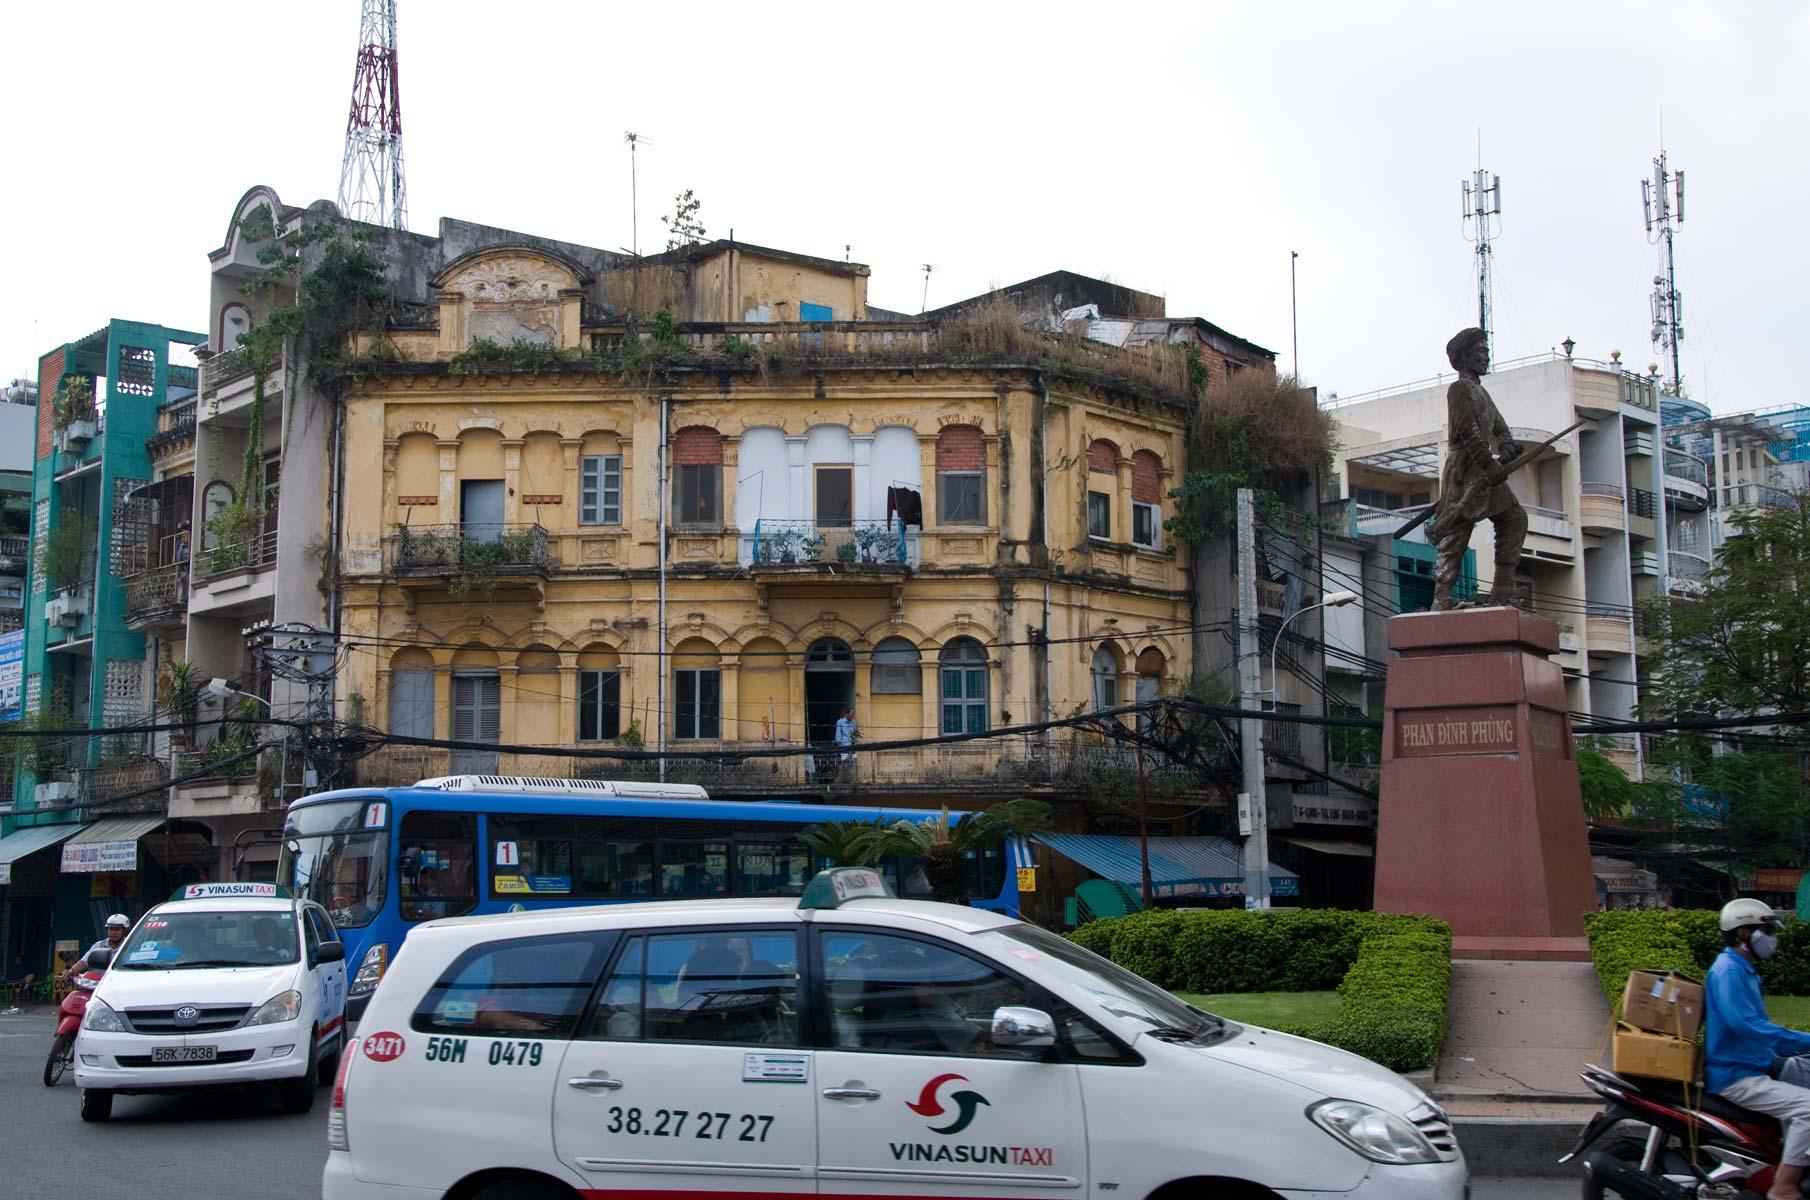 Straßenszene in Saigon (Ho-Chi-Minh Stadt), Vietnam